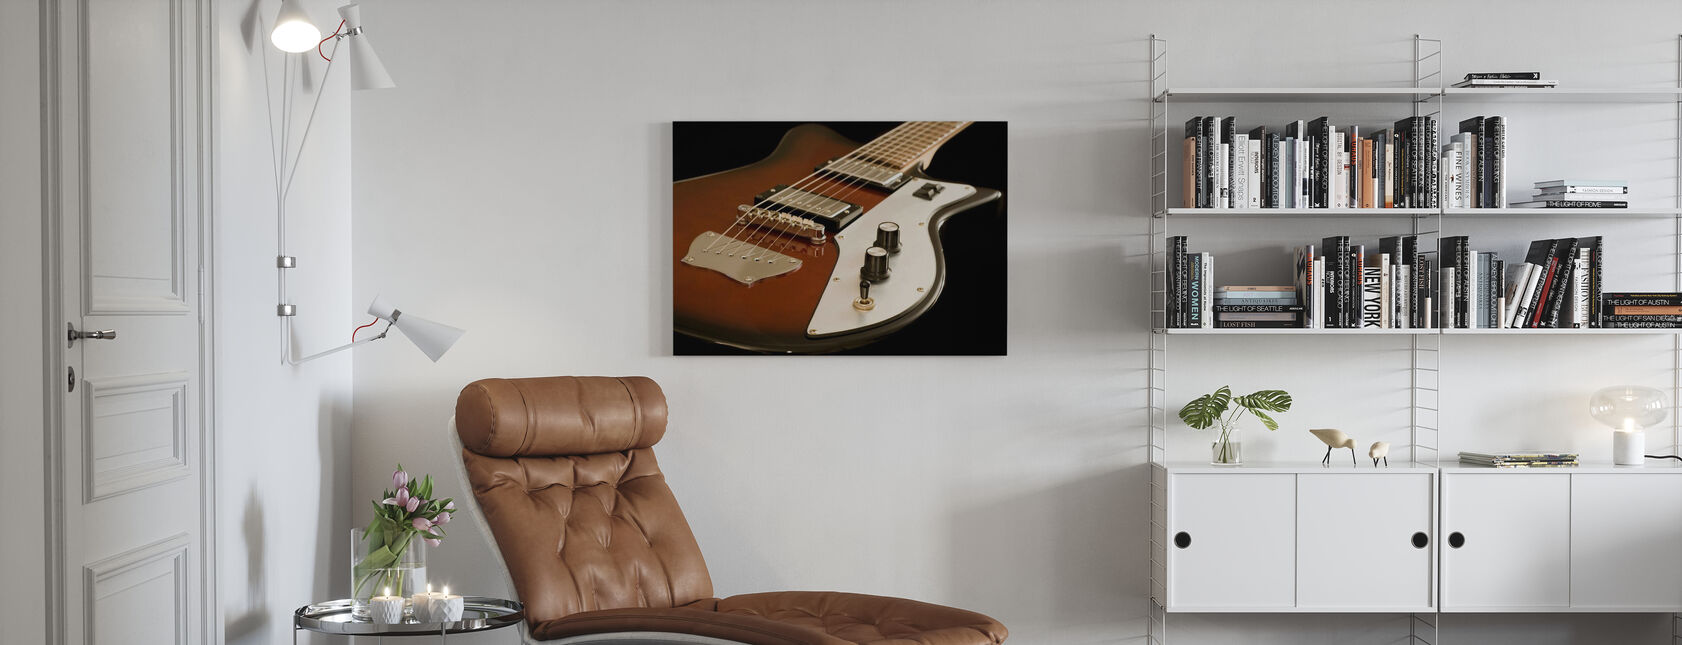 Electric Guitar - Canvas print - Living Room